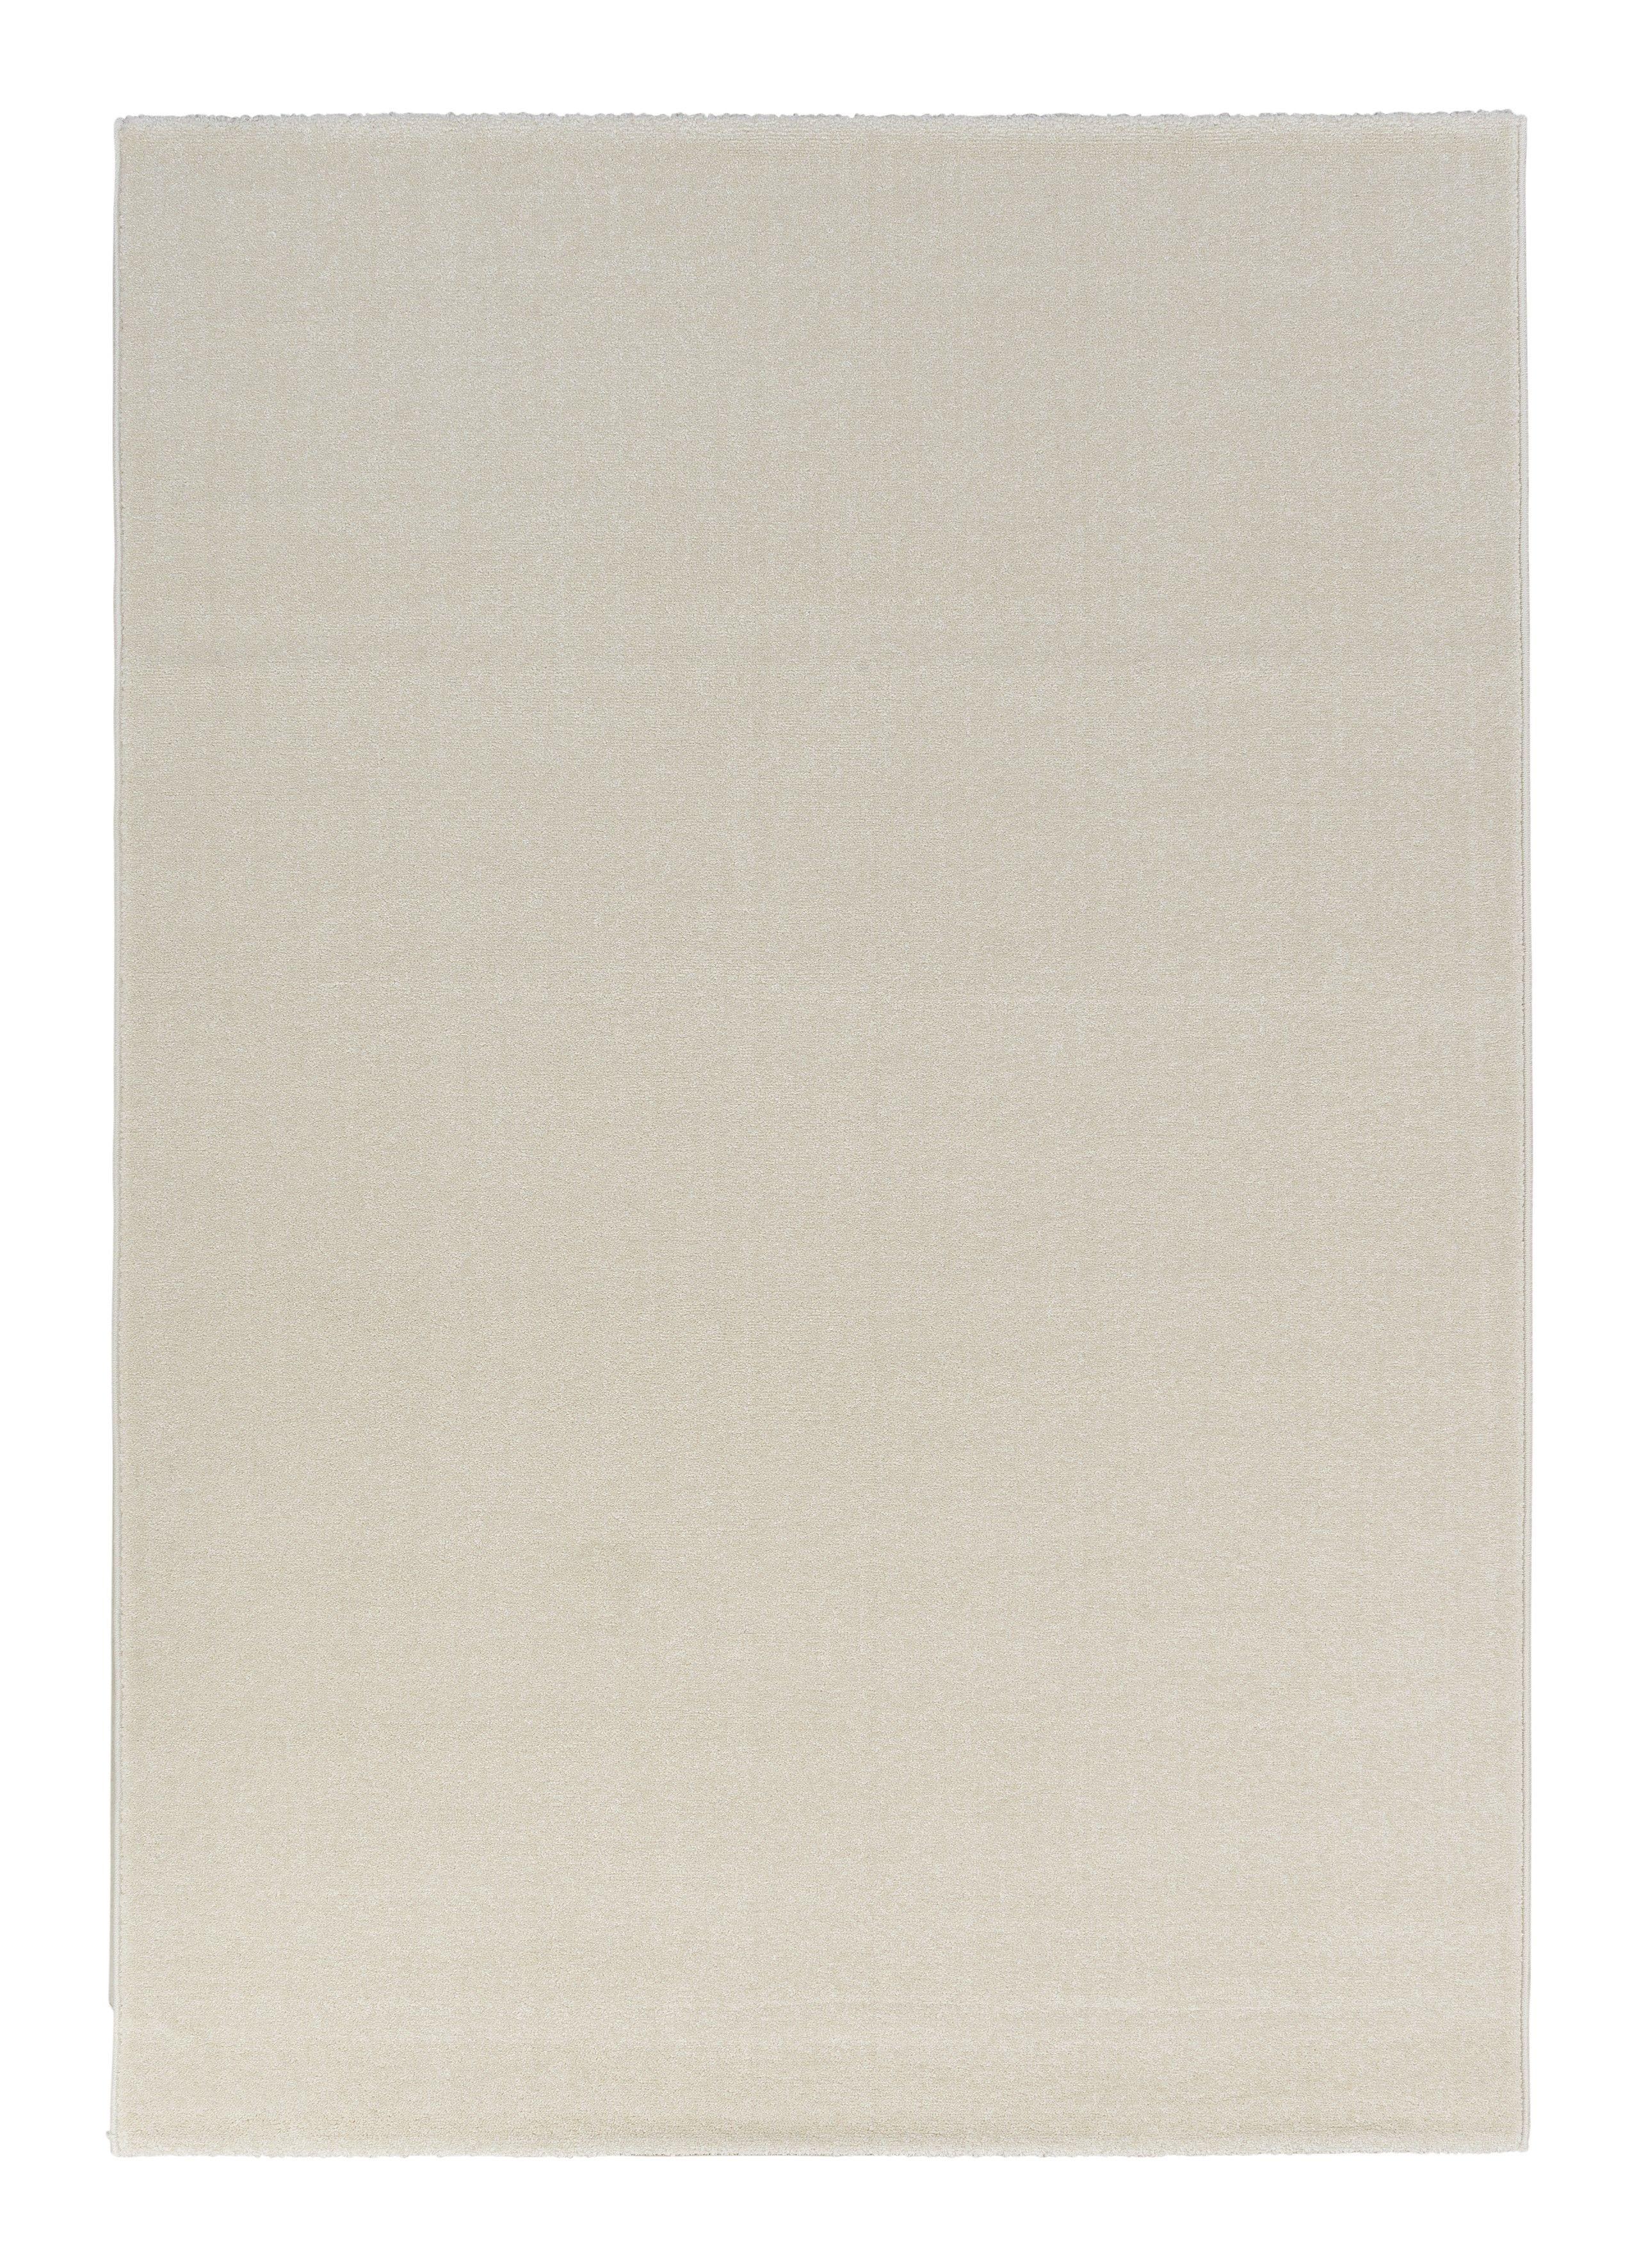 Astra - Golze koberce Kusový koberec Anzio 190000 Creme - 133x190 cm